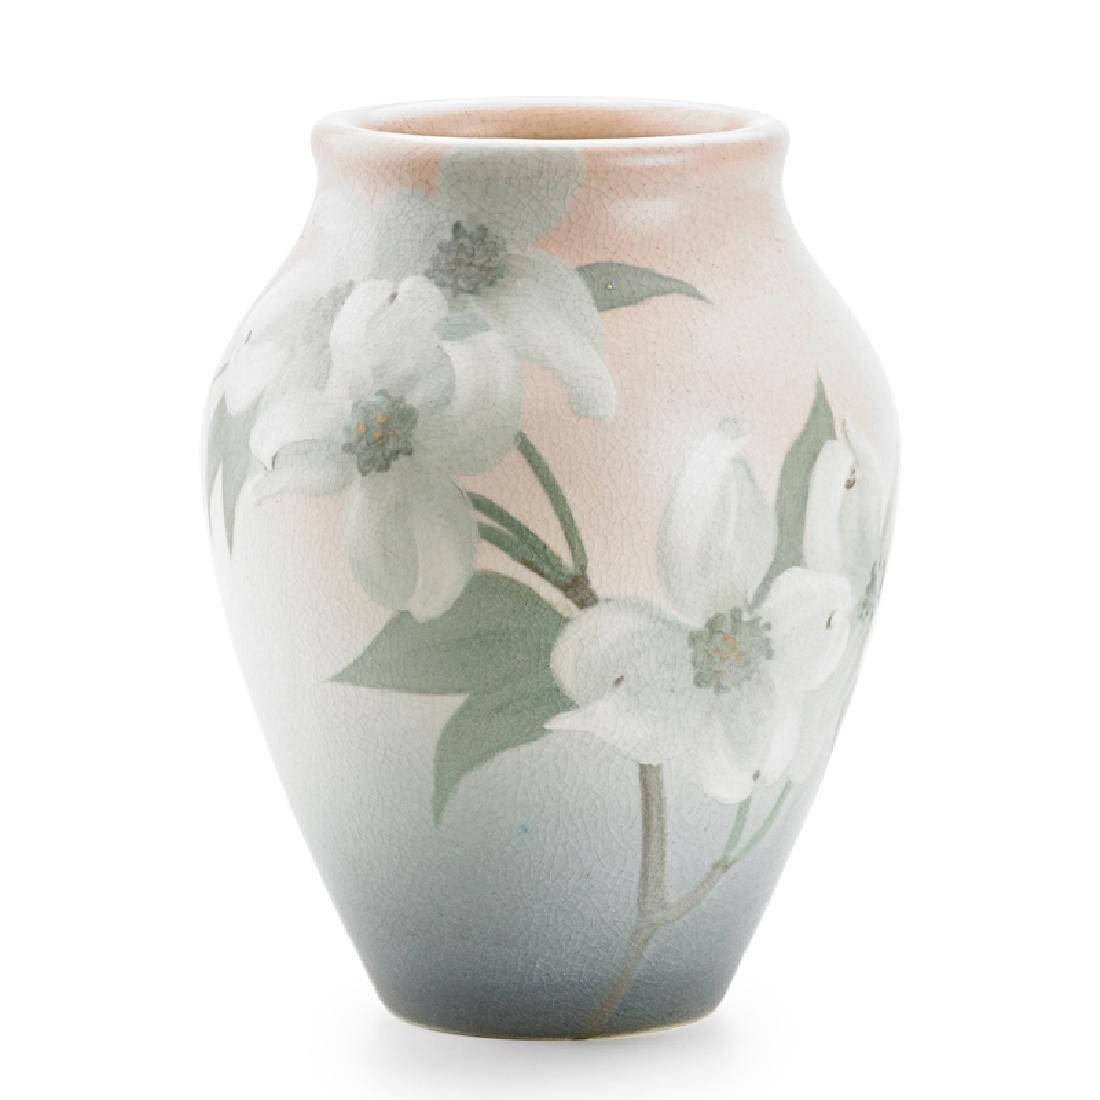 SARA SAX; ROOKWOOD Vellum vase